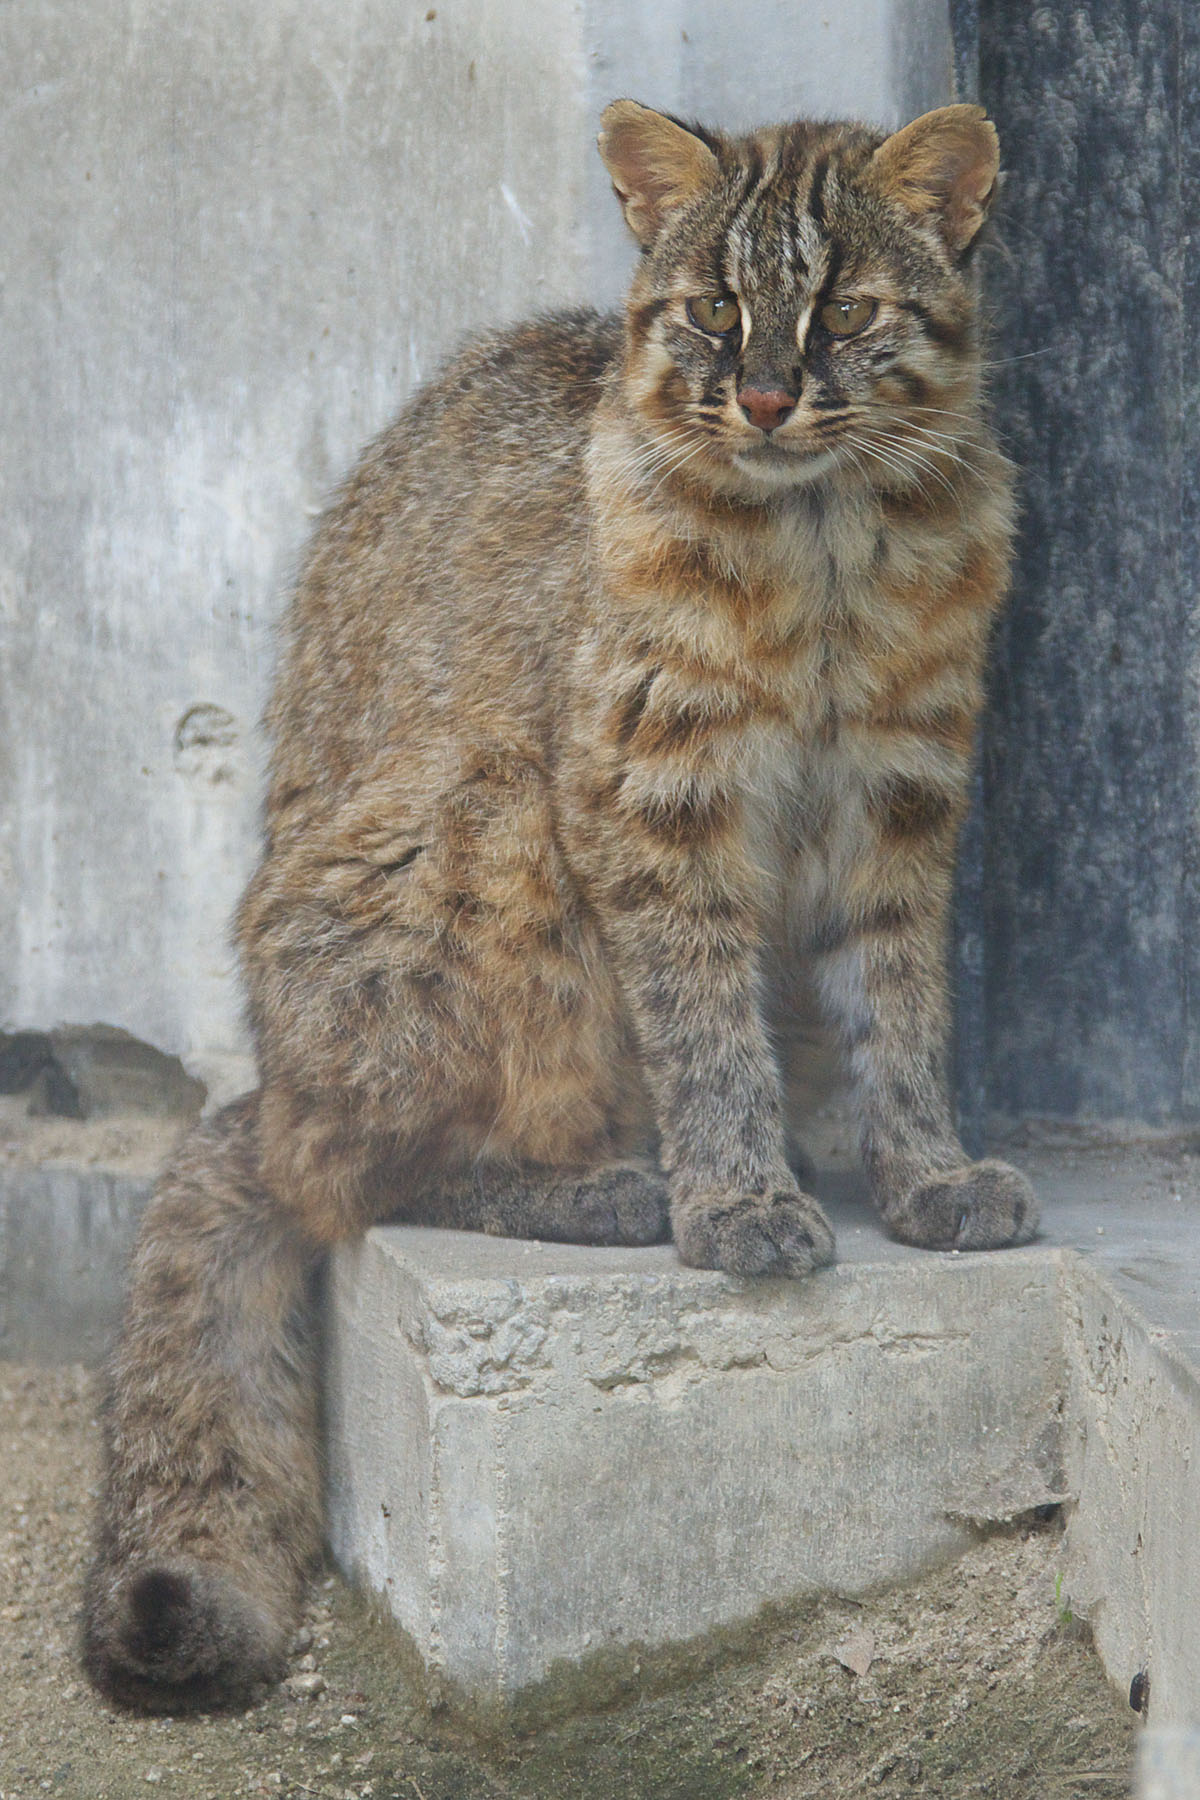 https://upload.wikimedia.org/wikipedia/commons/3/32/Tsushima_Cat_001.jpg